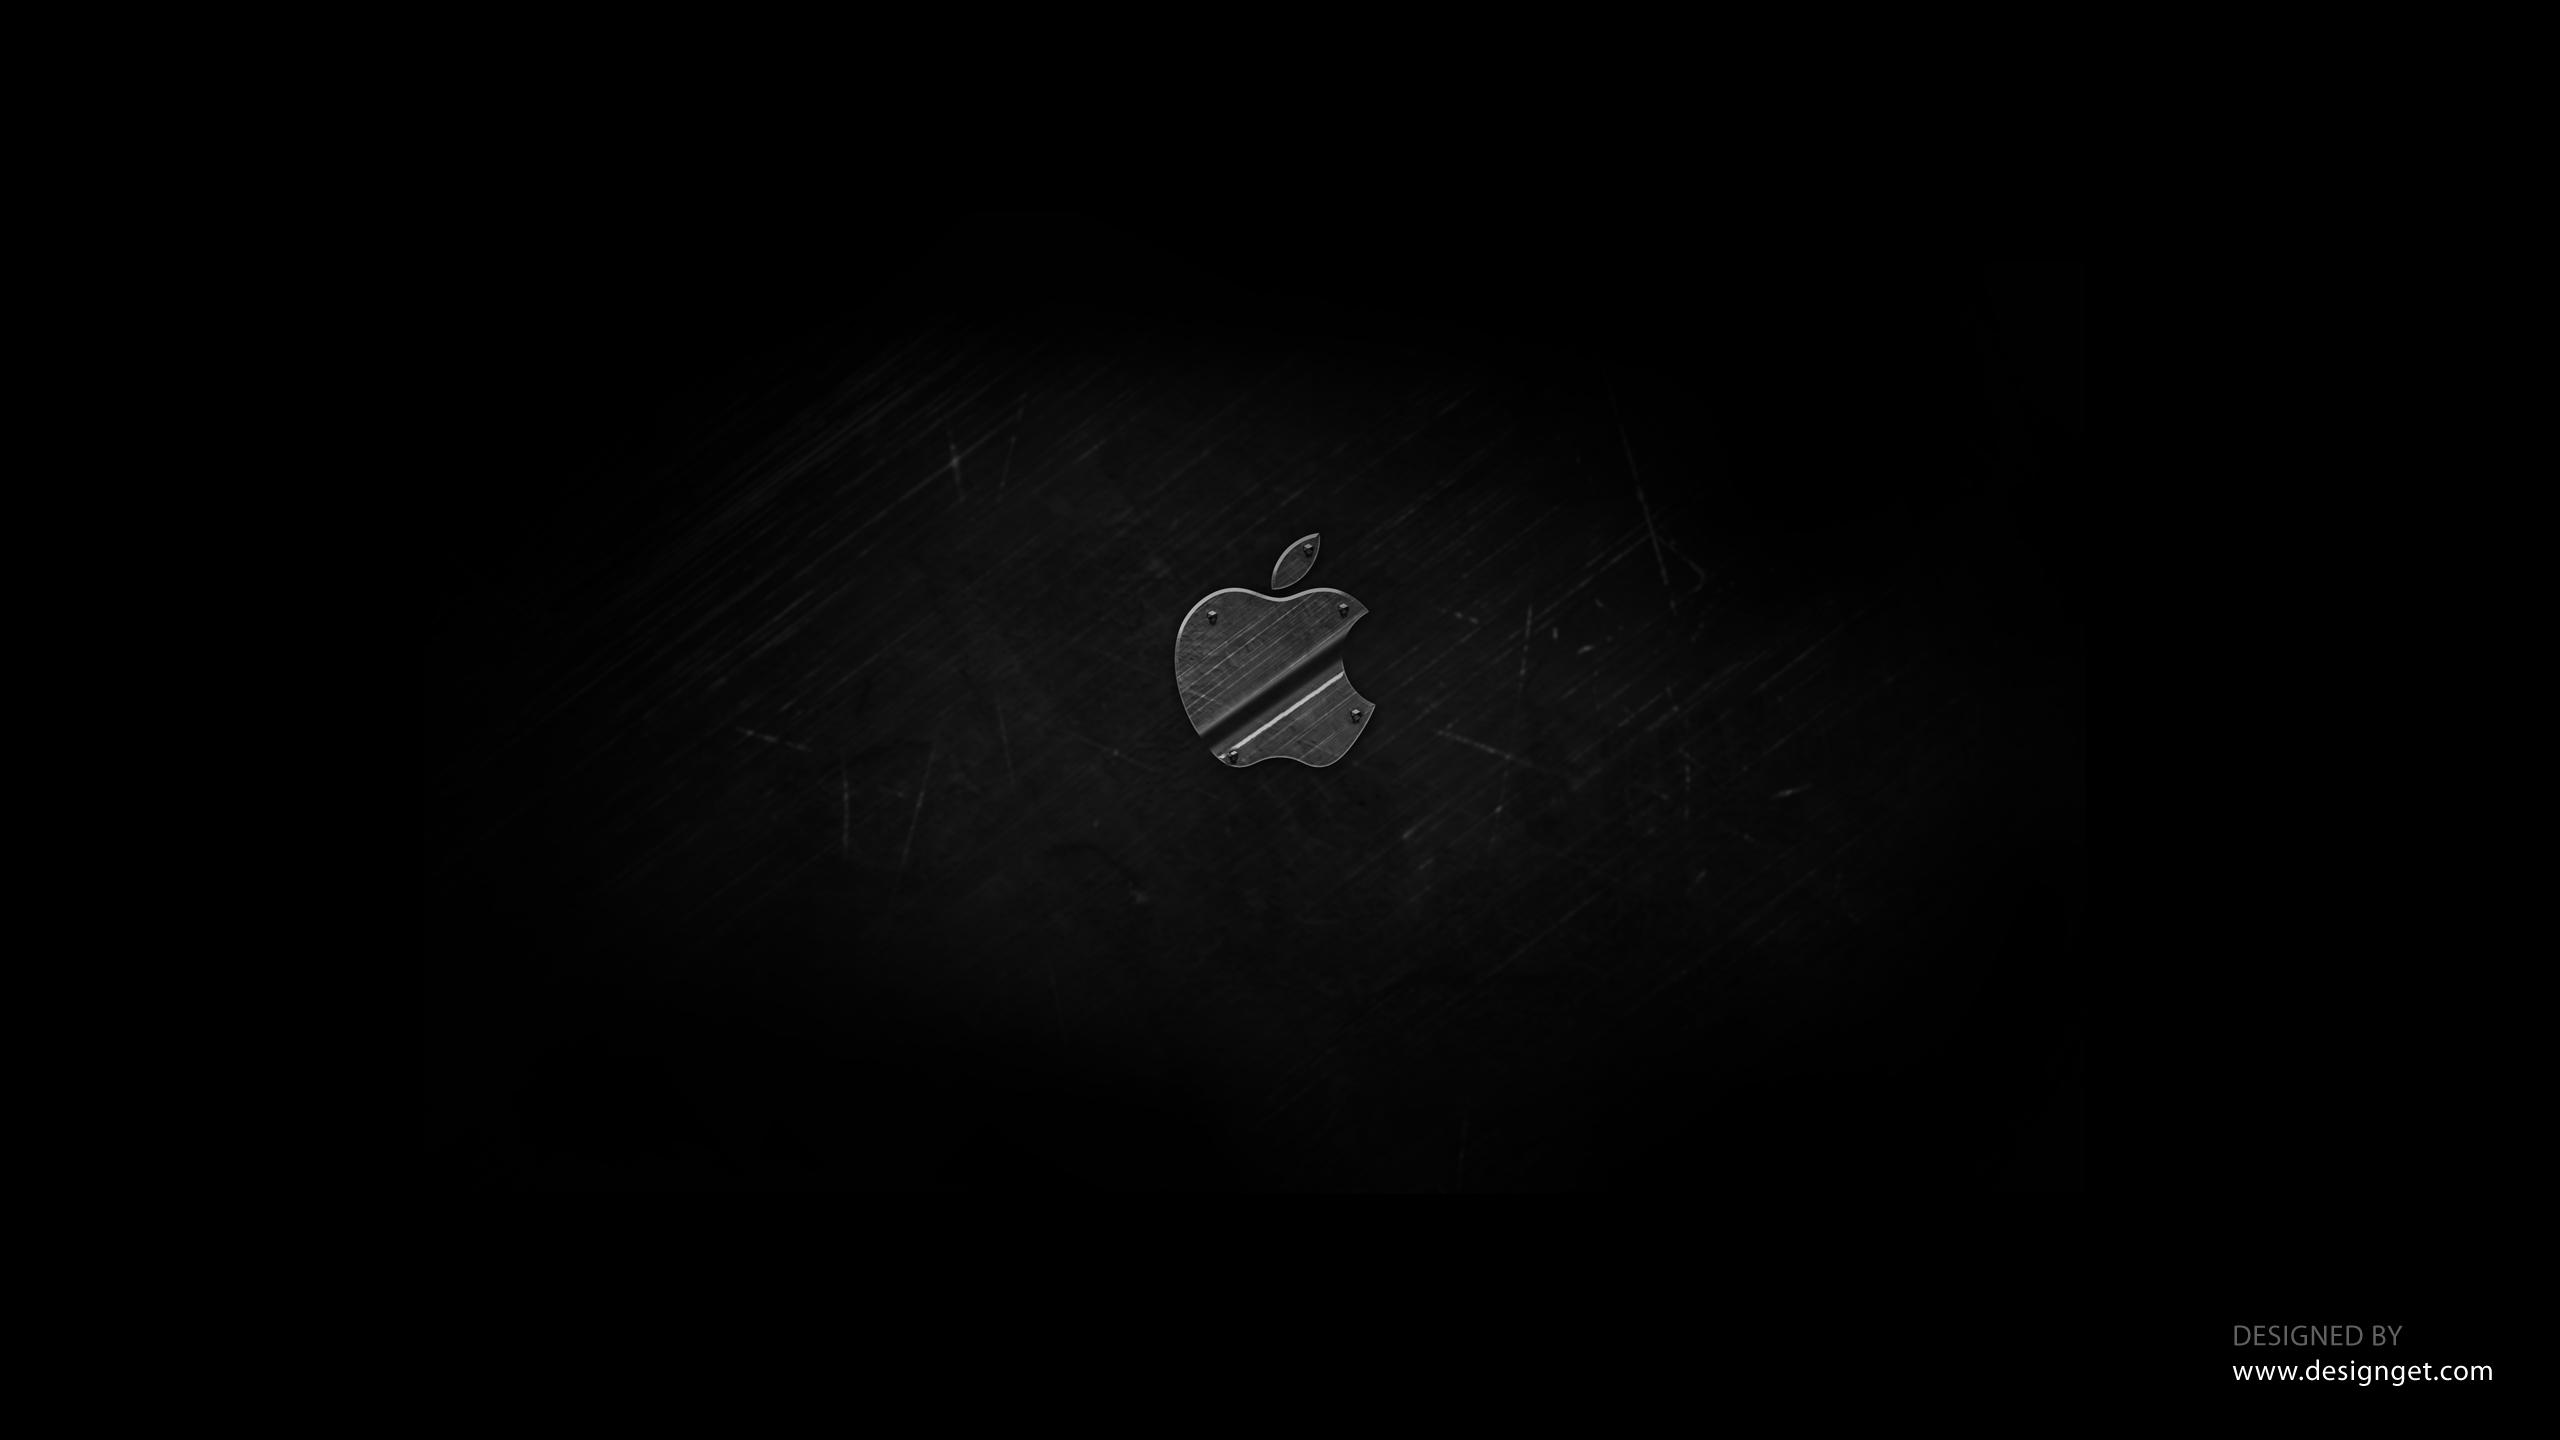 Free Download Tatouagcocccomimac 27 Inch Wallpaper 2560x1440 For Your Desktop Mobile Tablet Explore 49 Imac 27 Wallpaper 5k Image Hd Wallpaper Imac Wallpaper Hd Ipad Pro Wallpapers 2732x2732